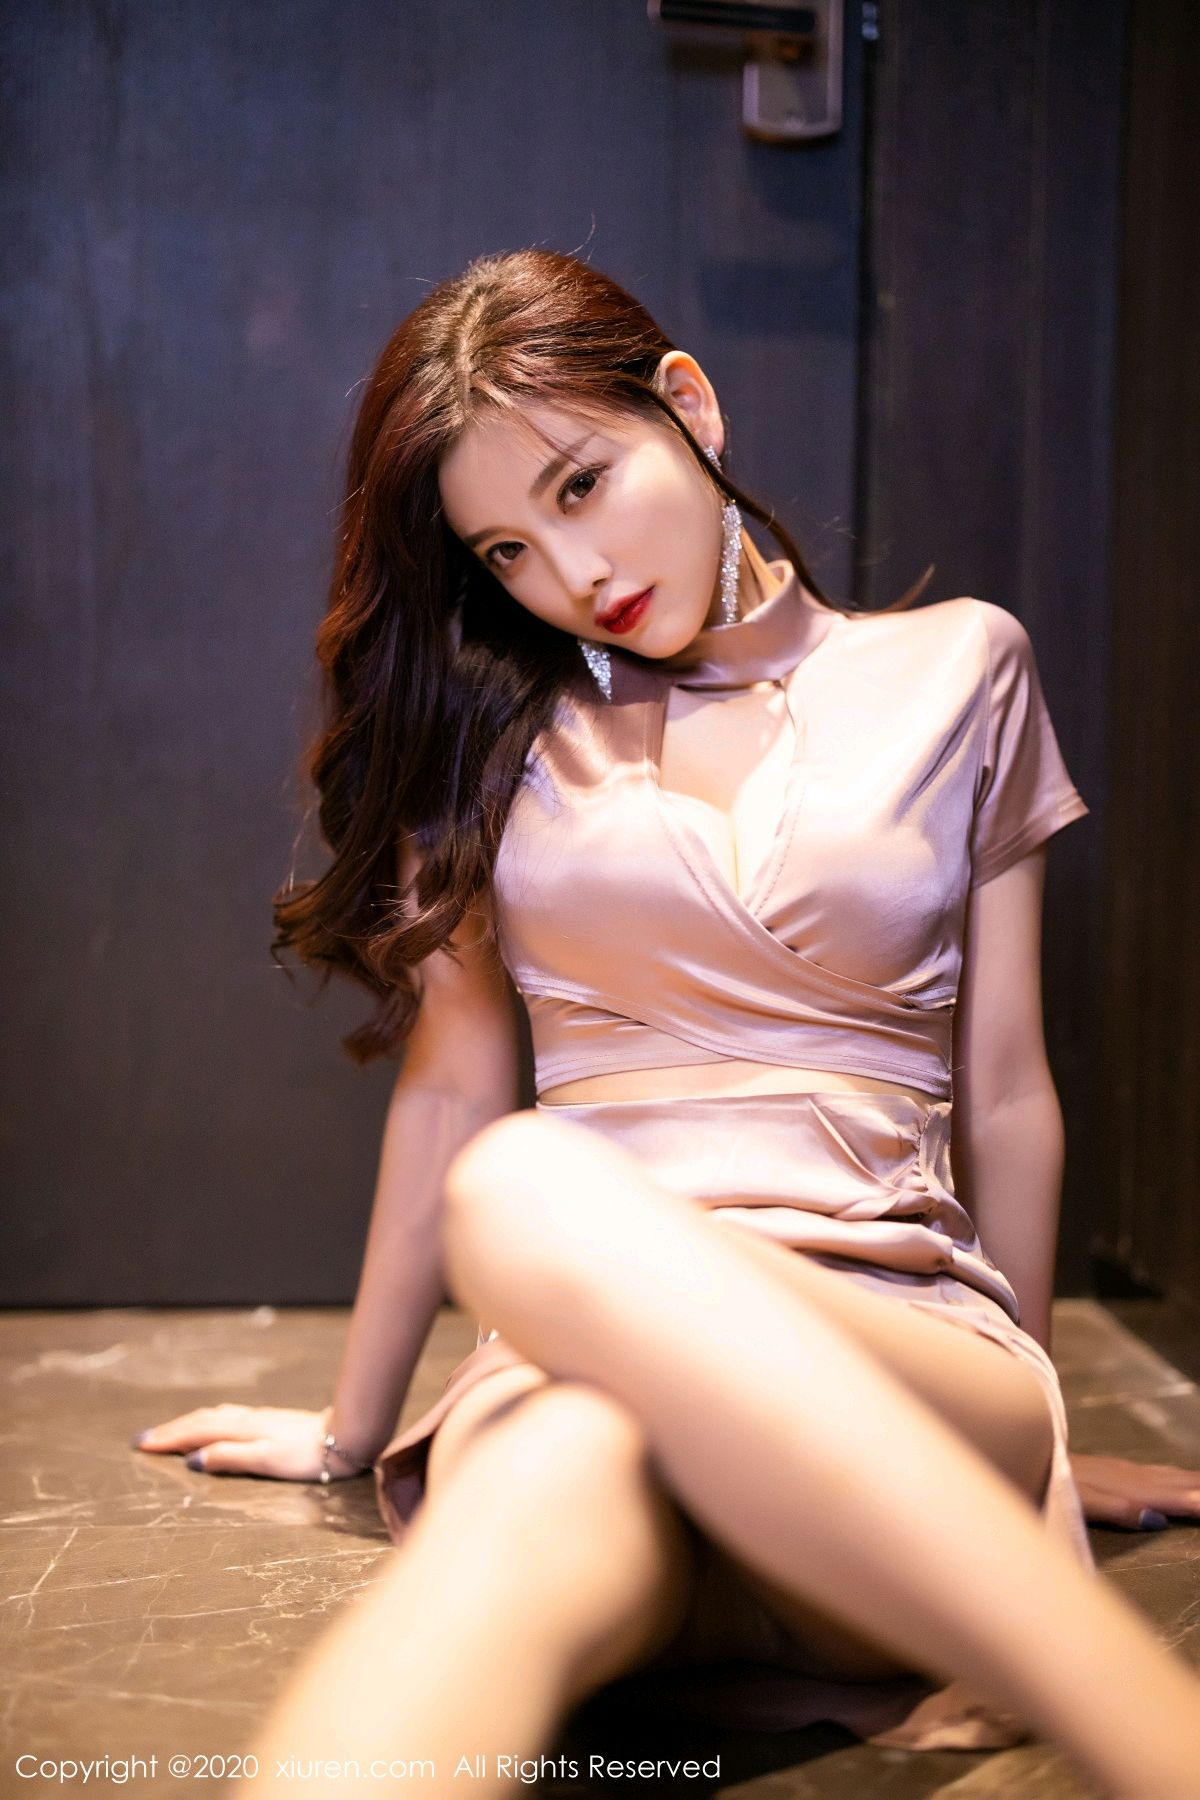 [XiuRen] Vol.2587 Yang Chen Chen 48P, Underwear, Xiuren, Yang Chen Chen